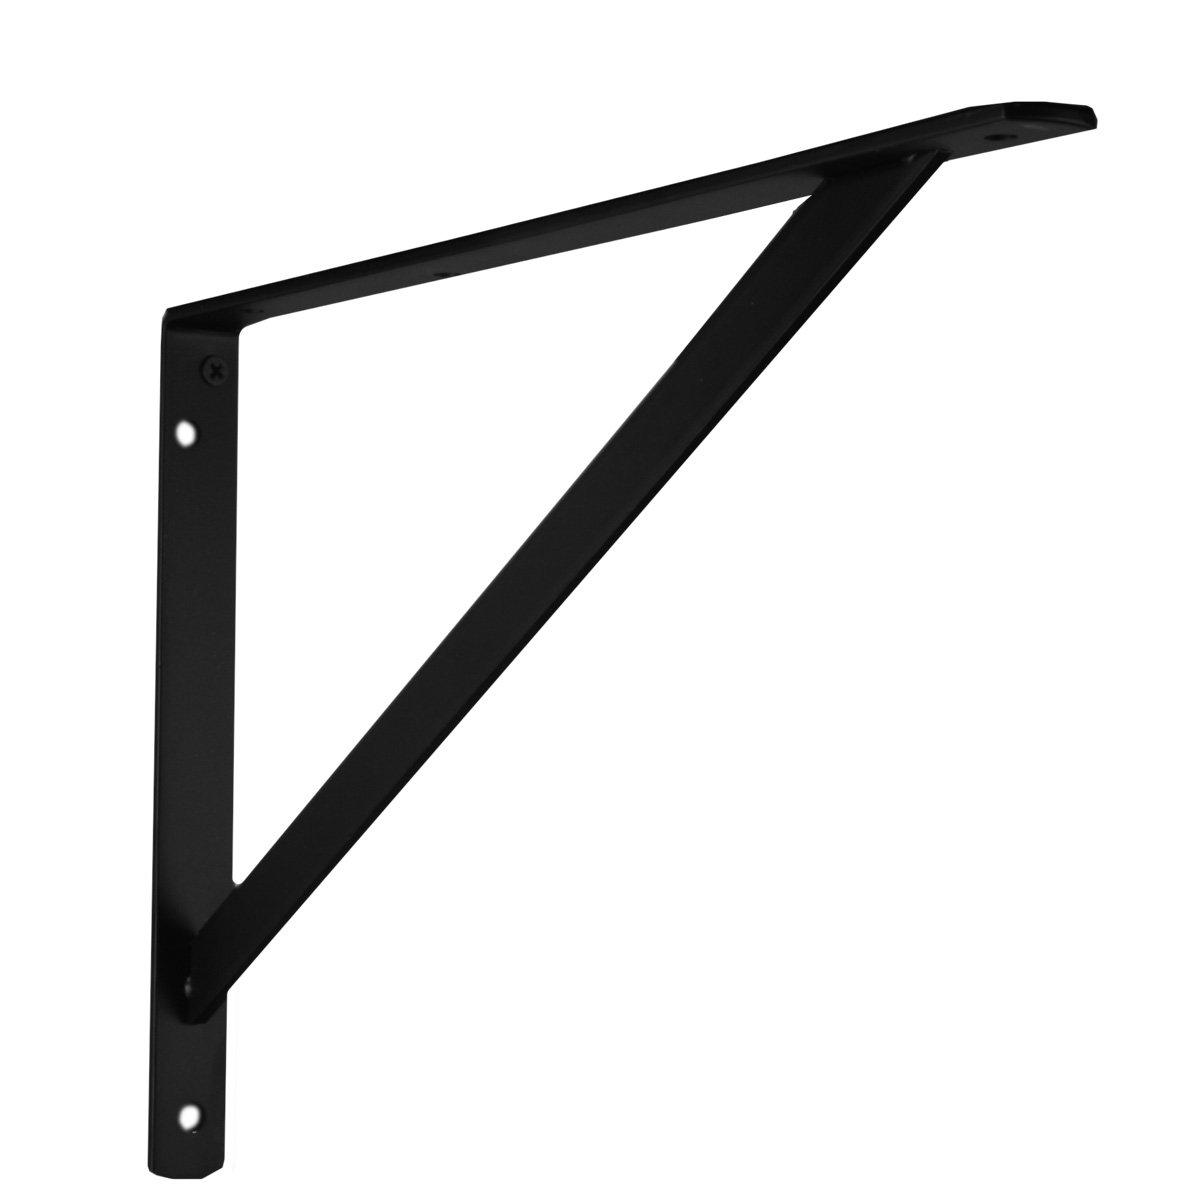 John Sterling THE MAX BRACKET Shelf Bracket, 16-inch, Black, 0049-16BKH